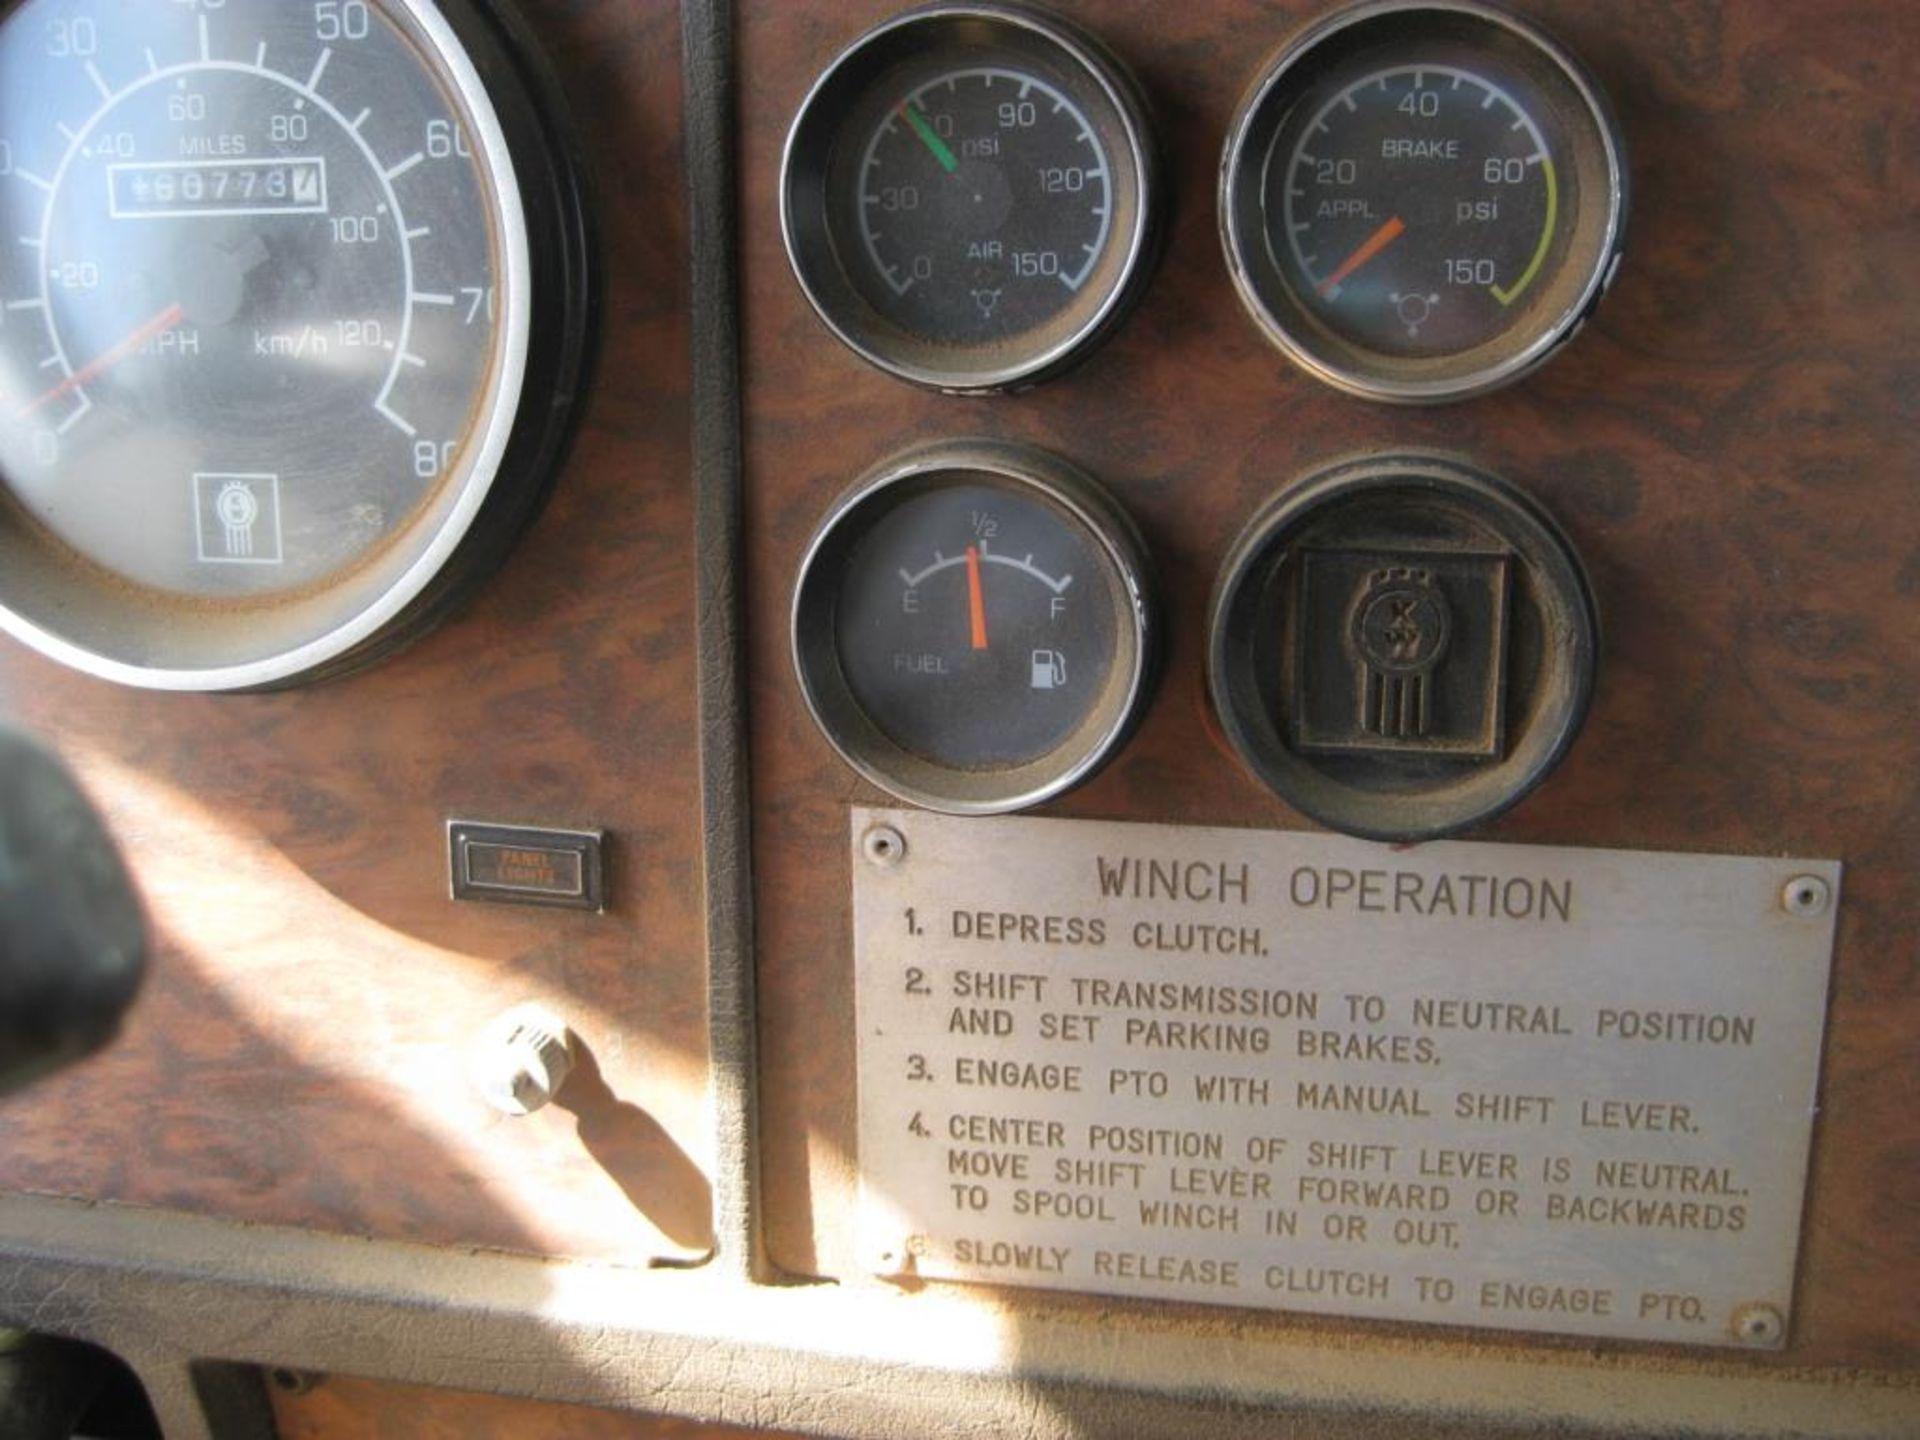 Kenworth Winch Truck - Image 18 of 23